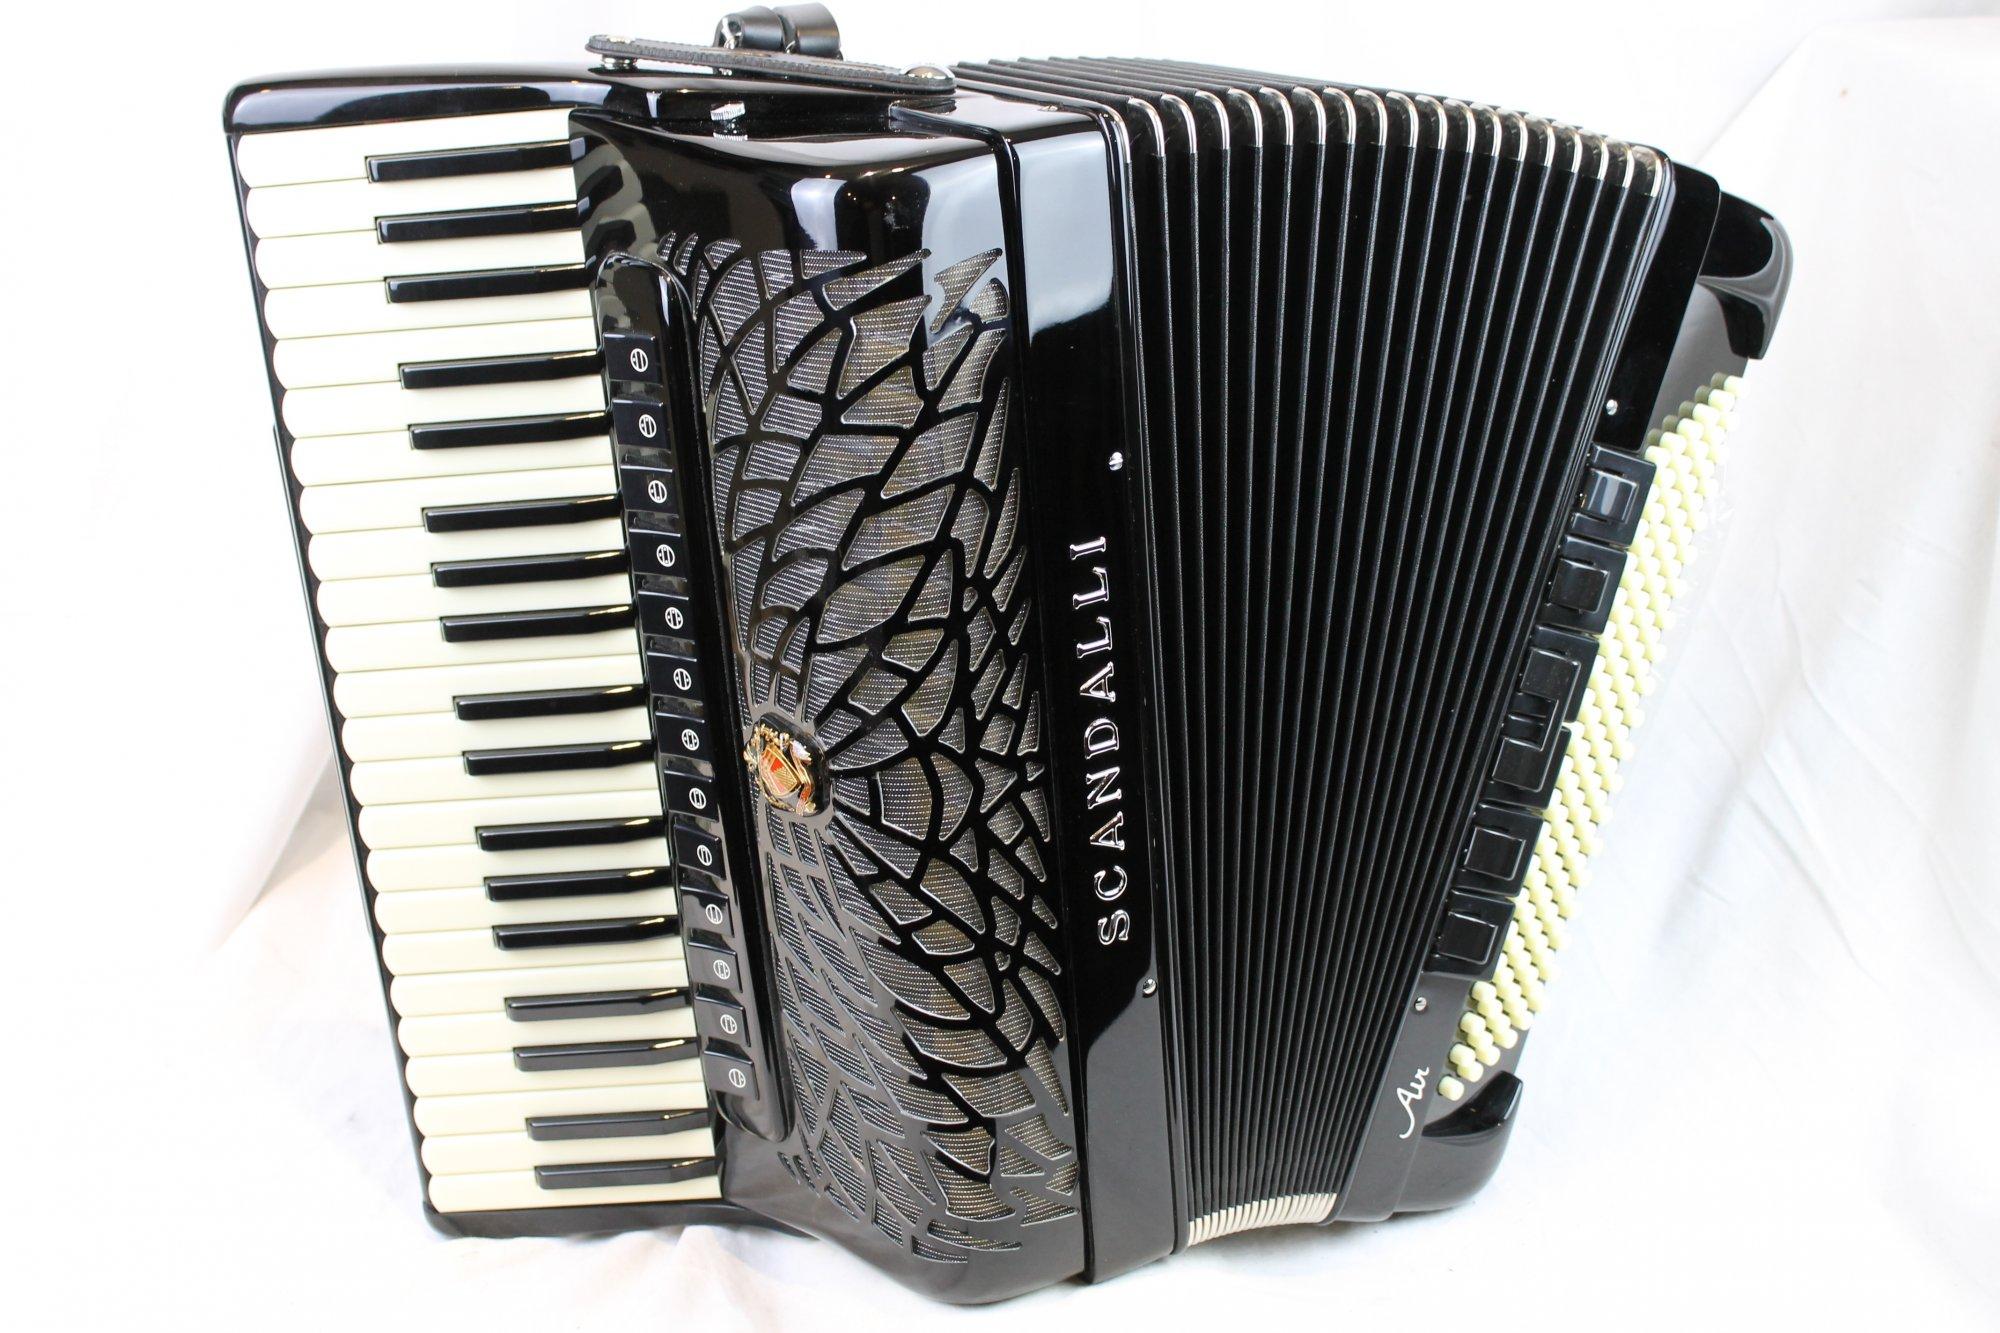 NEW Black Scandalli Air VI Piano Accordion LMMH 41 120